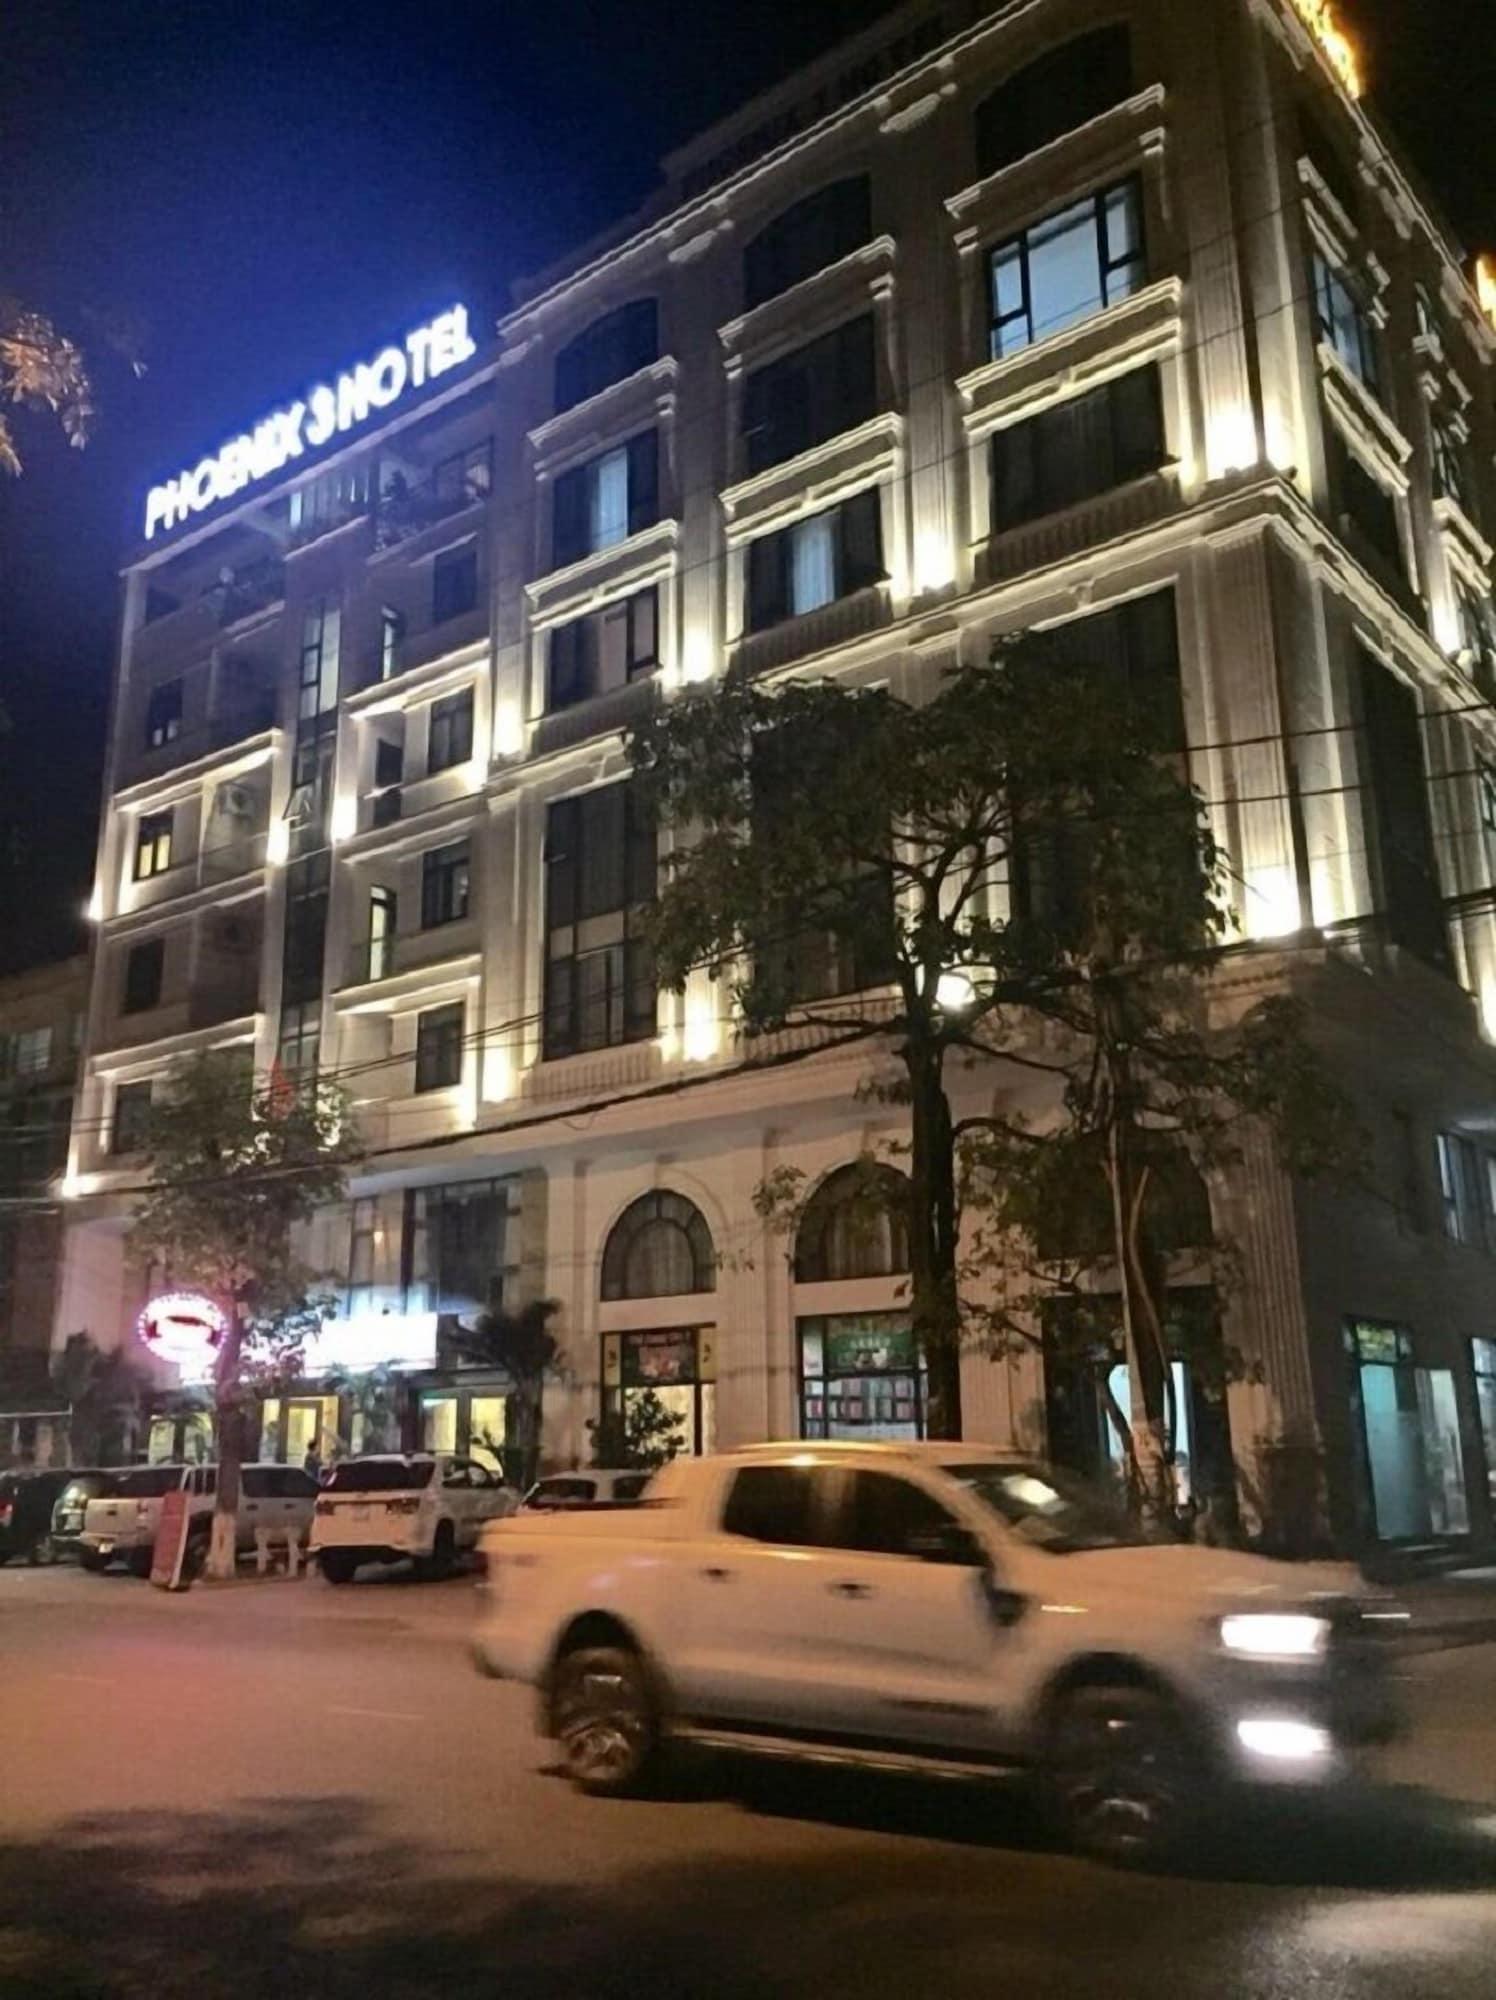 Phoenix 3 International Hotel, Bắc Ninh